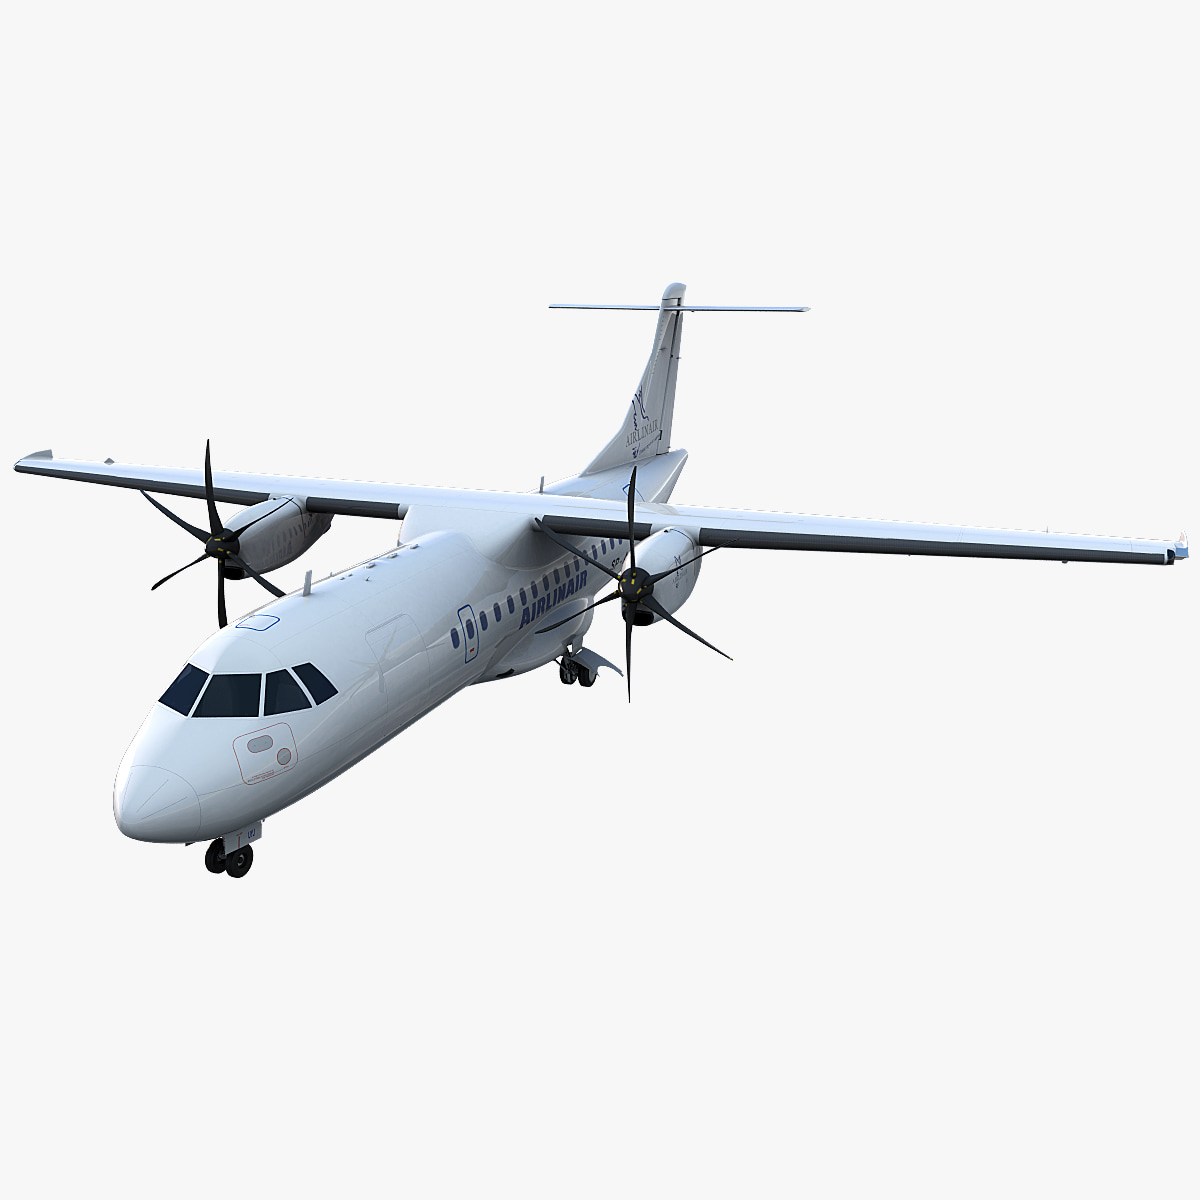 Passenger_Aircraft_ATR_42_Vray.jpg